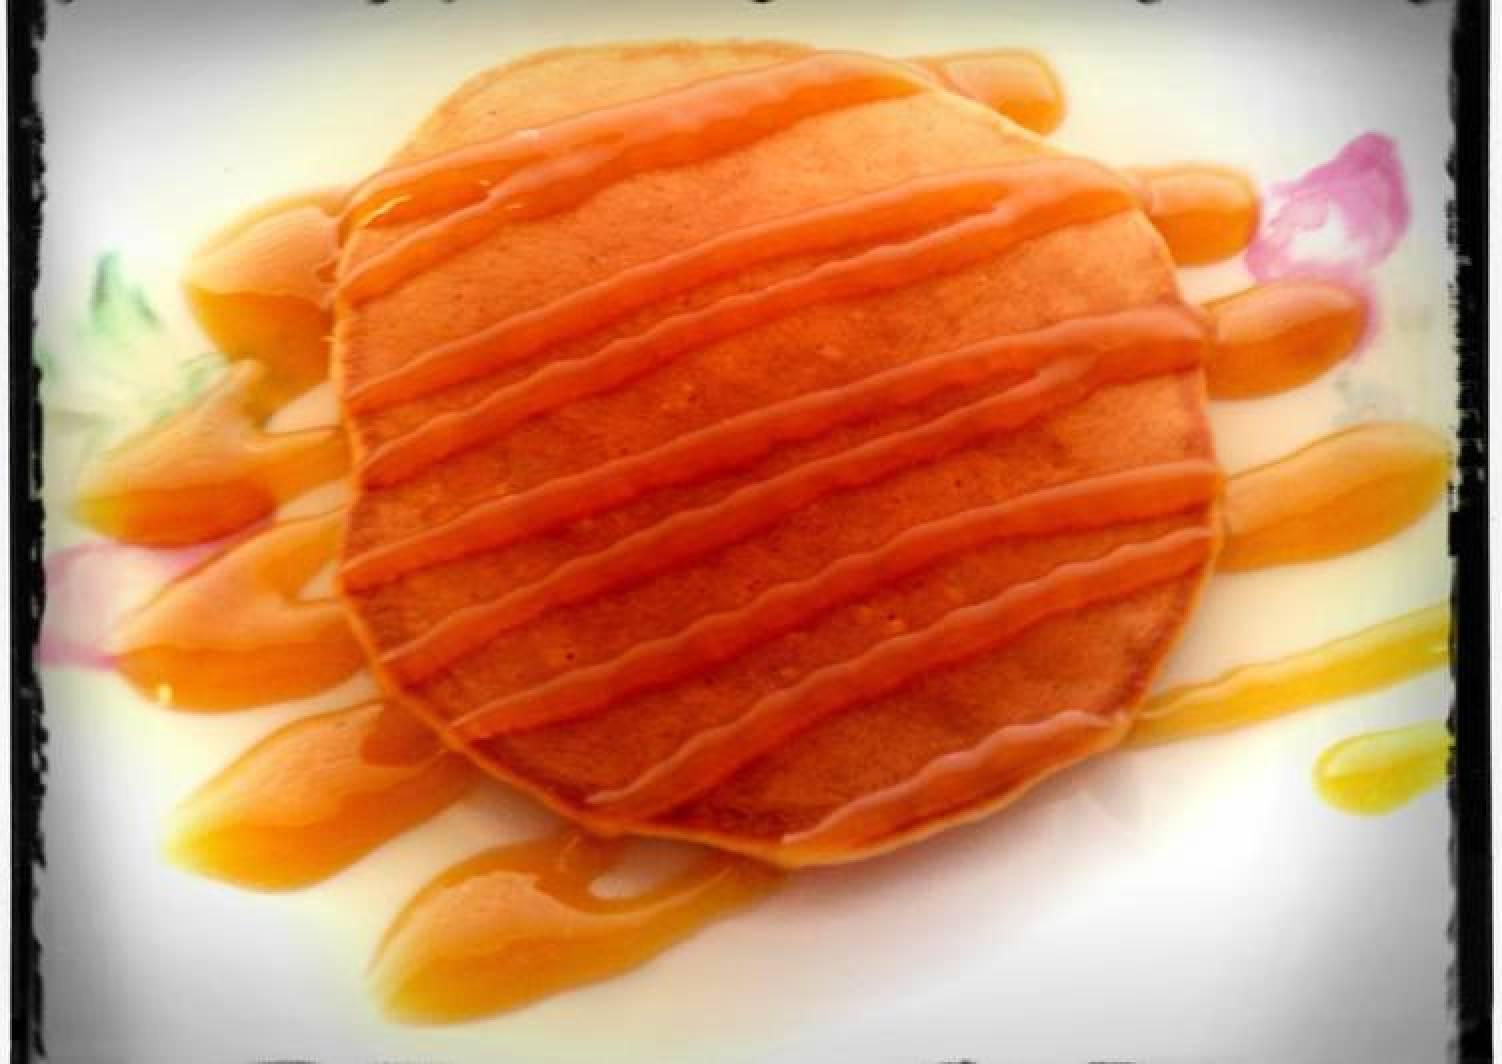 Momma's Apple pie pancakes